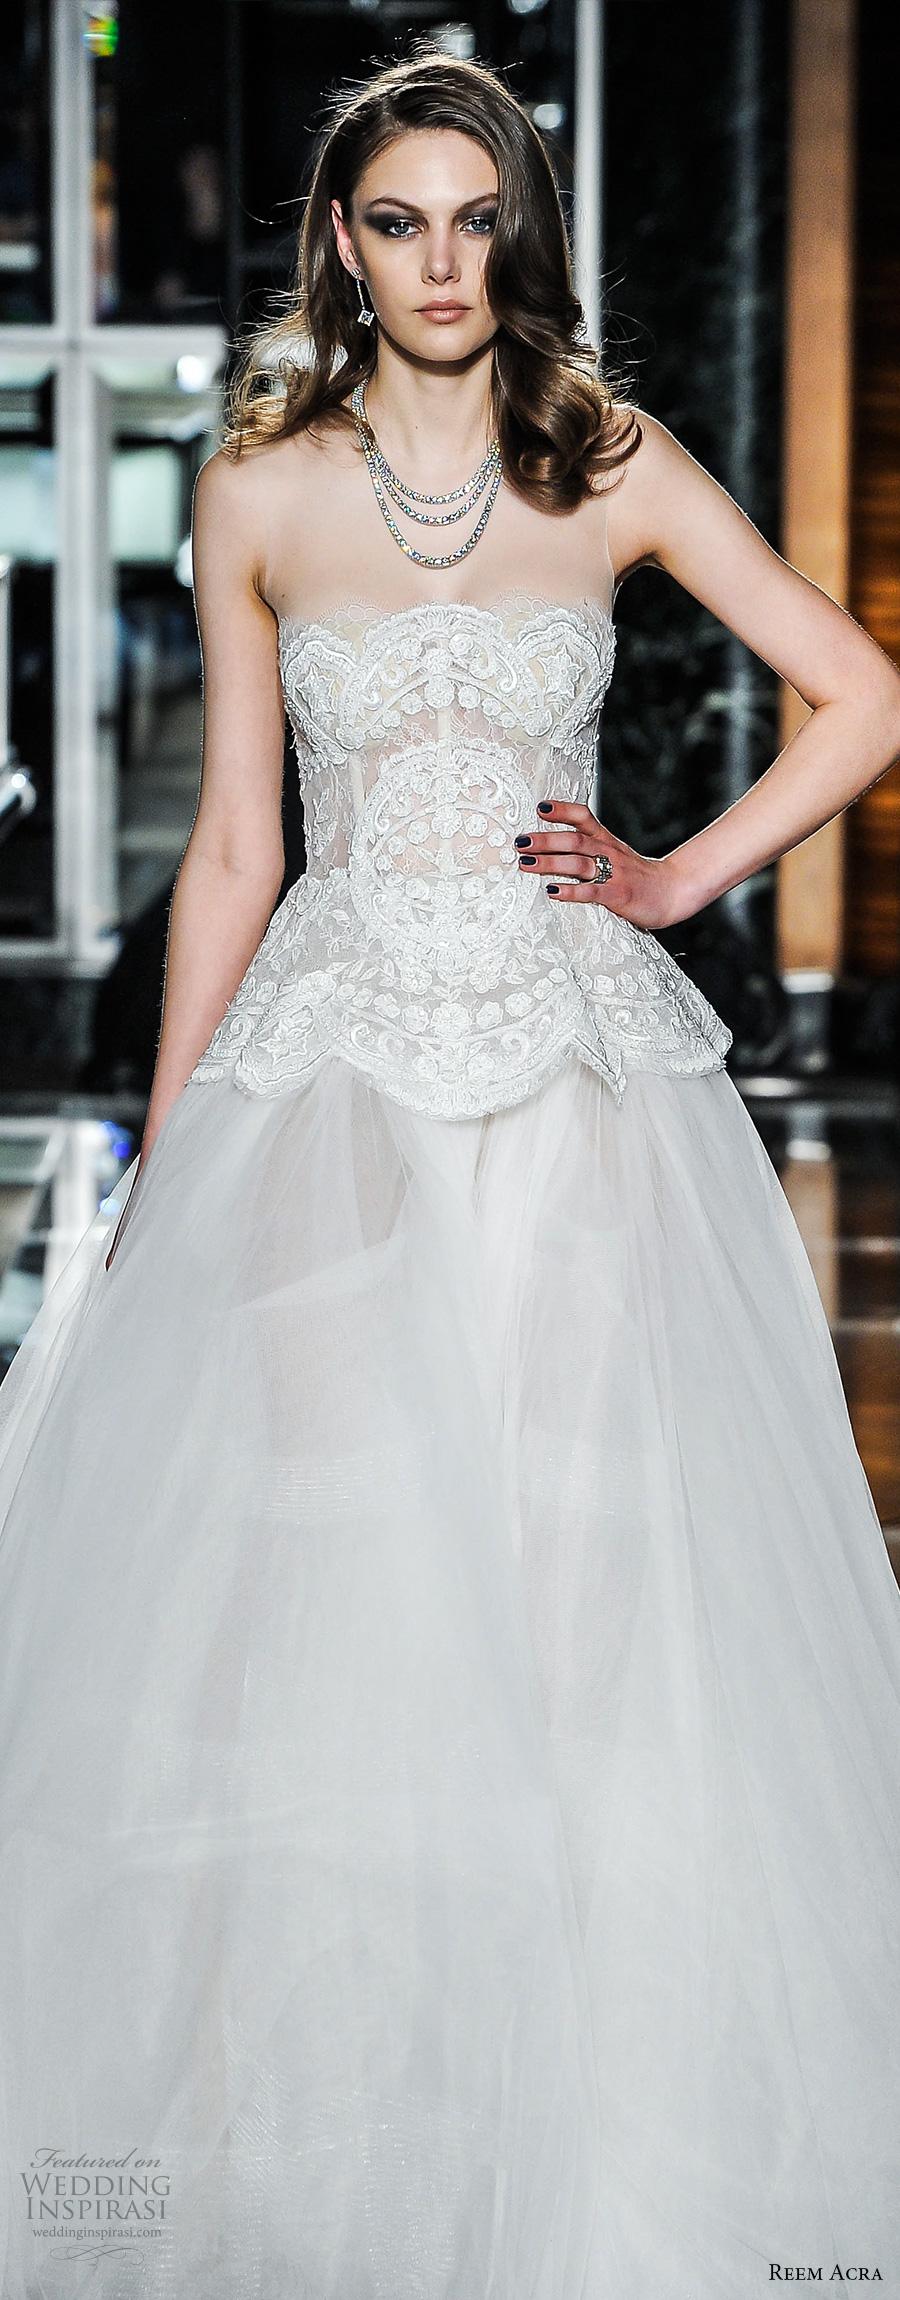 Short Tulle Wedding Dress 72 Trend reem acra spring bridal